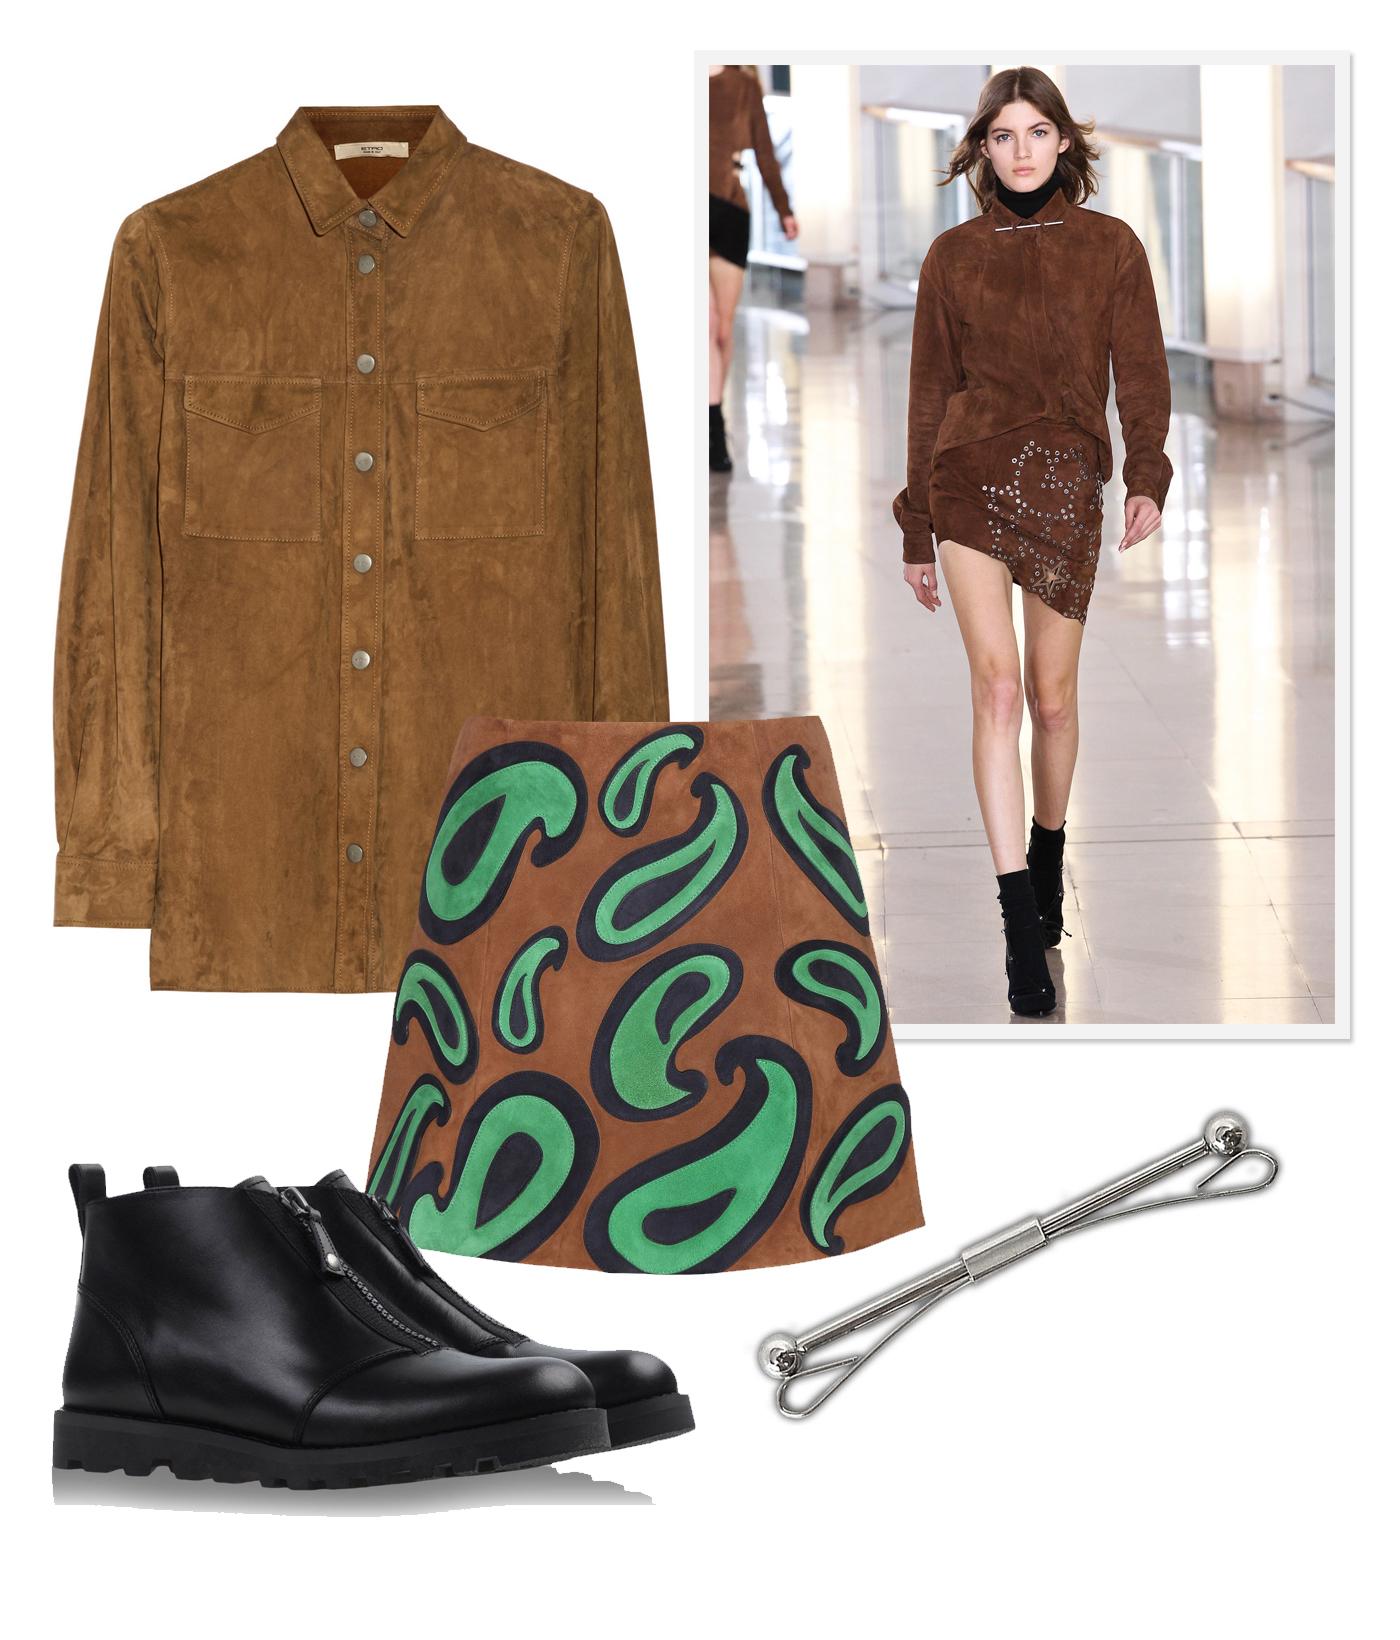 fall-2015-trends-shopping-01.jpg